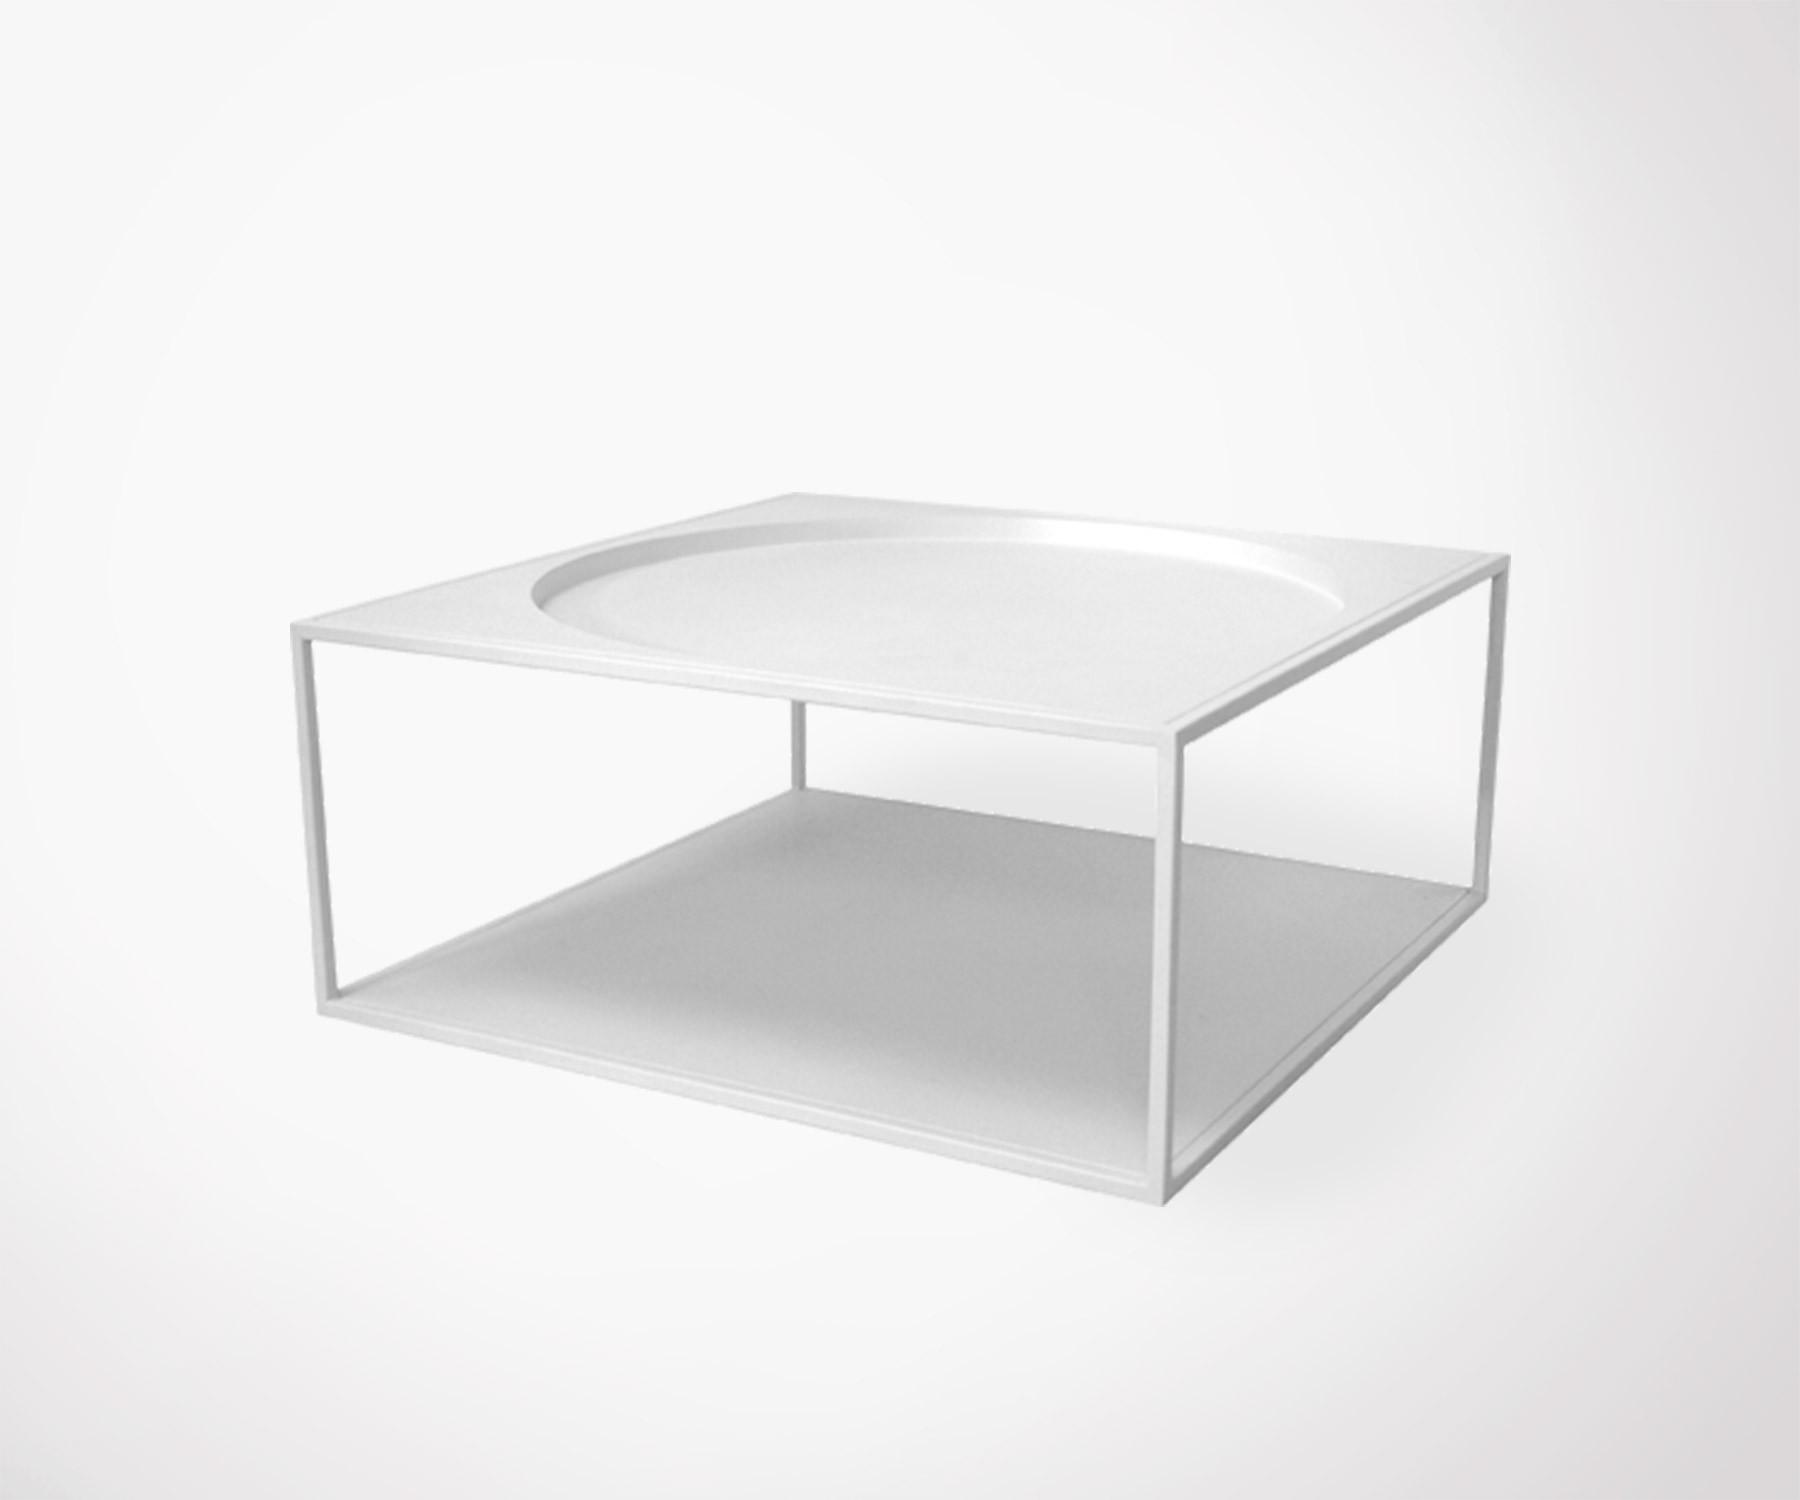 einzigartig table basse tulipe id es de conception de table basse. Black Bedroom Furniture Sets. Home Design Ideas